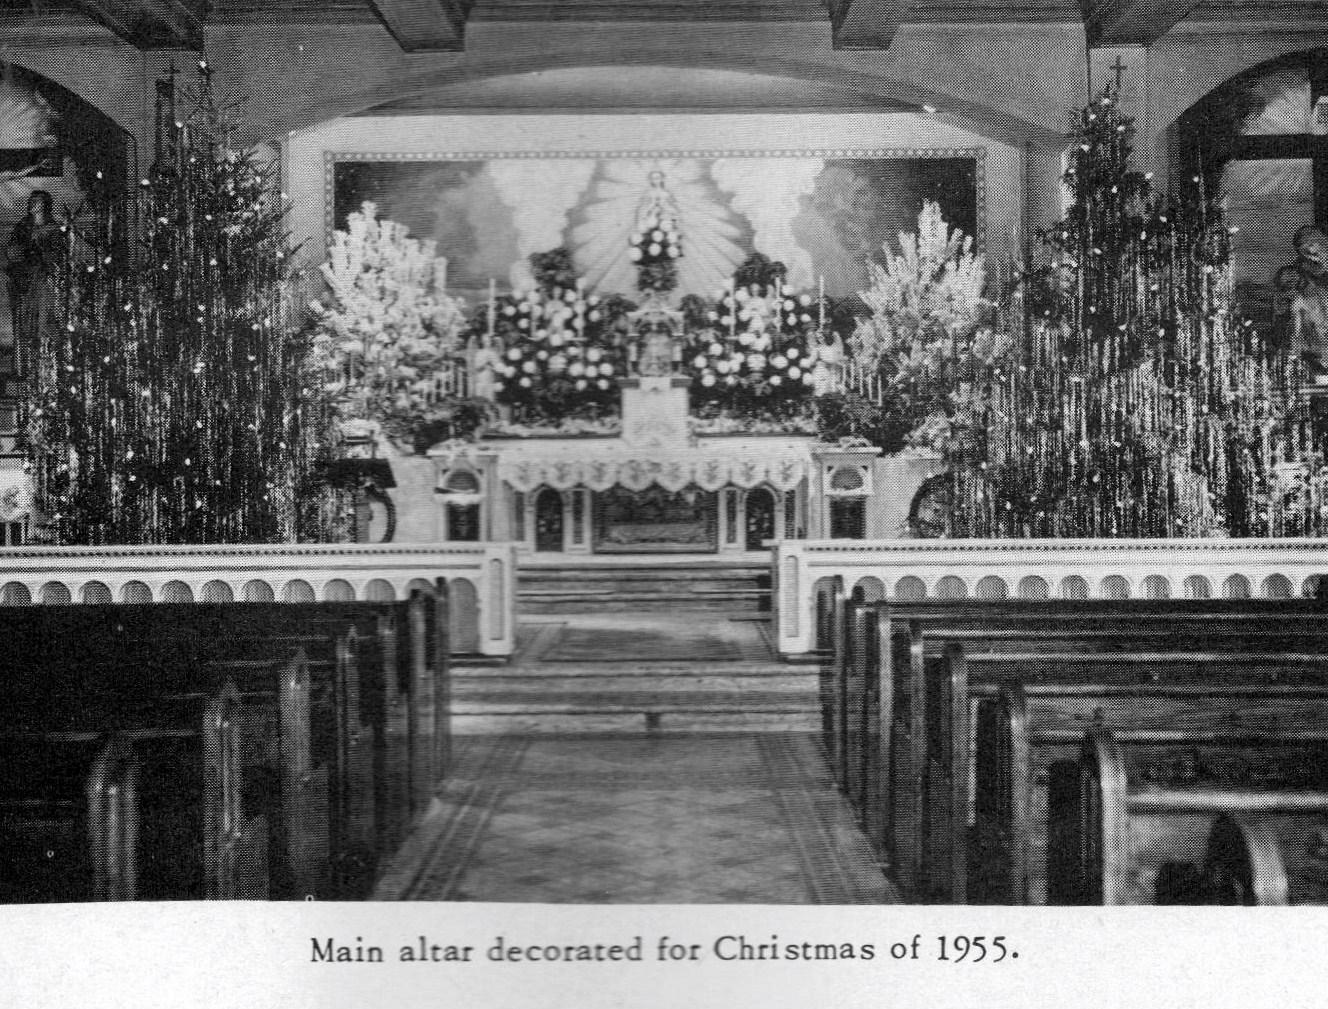 chuch interior at xmas 1955.jpg